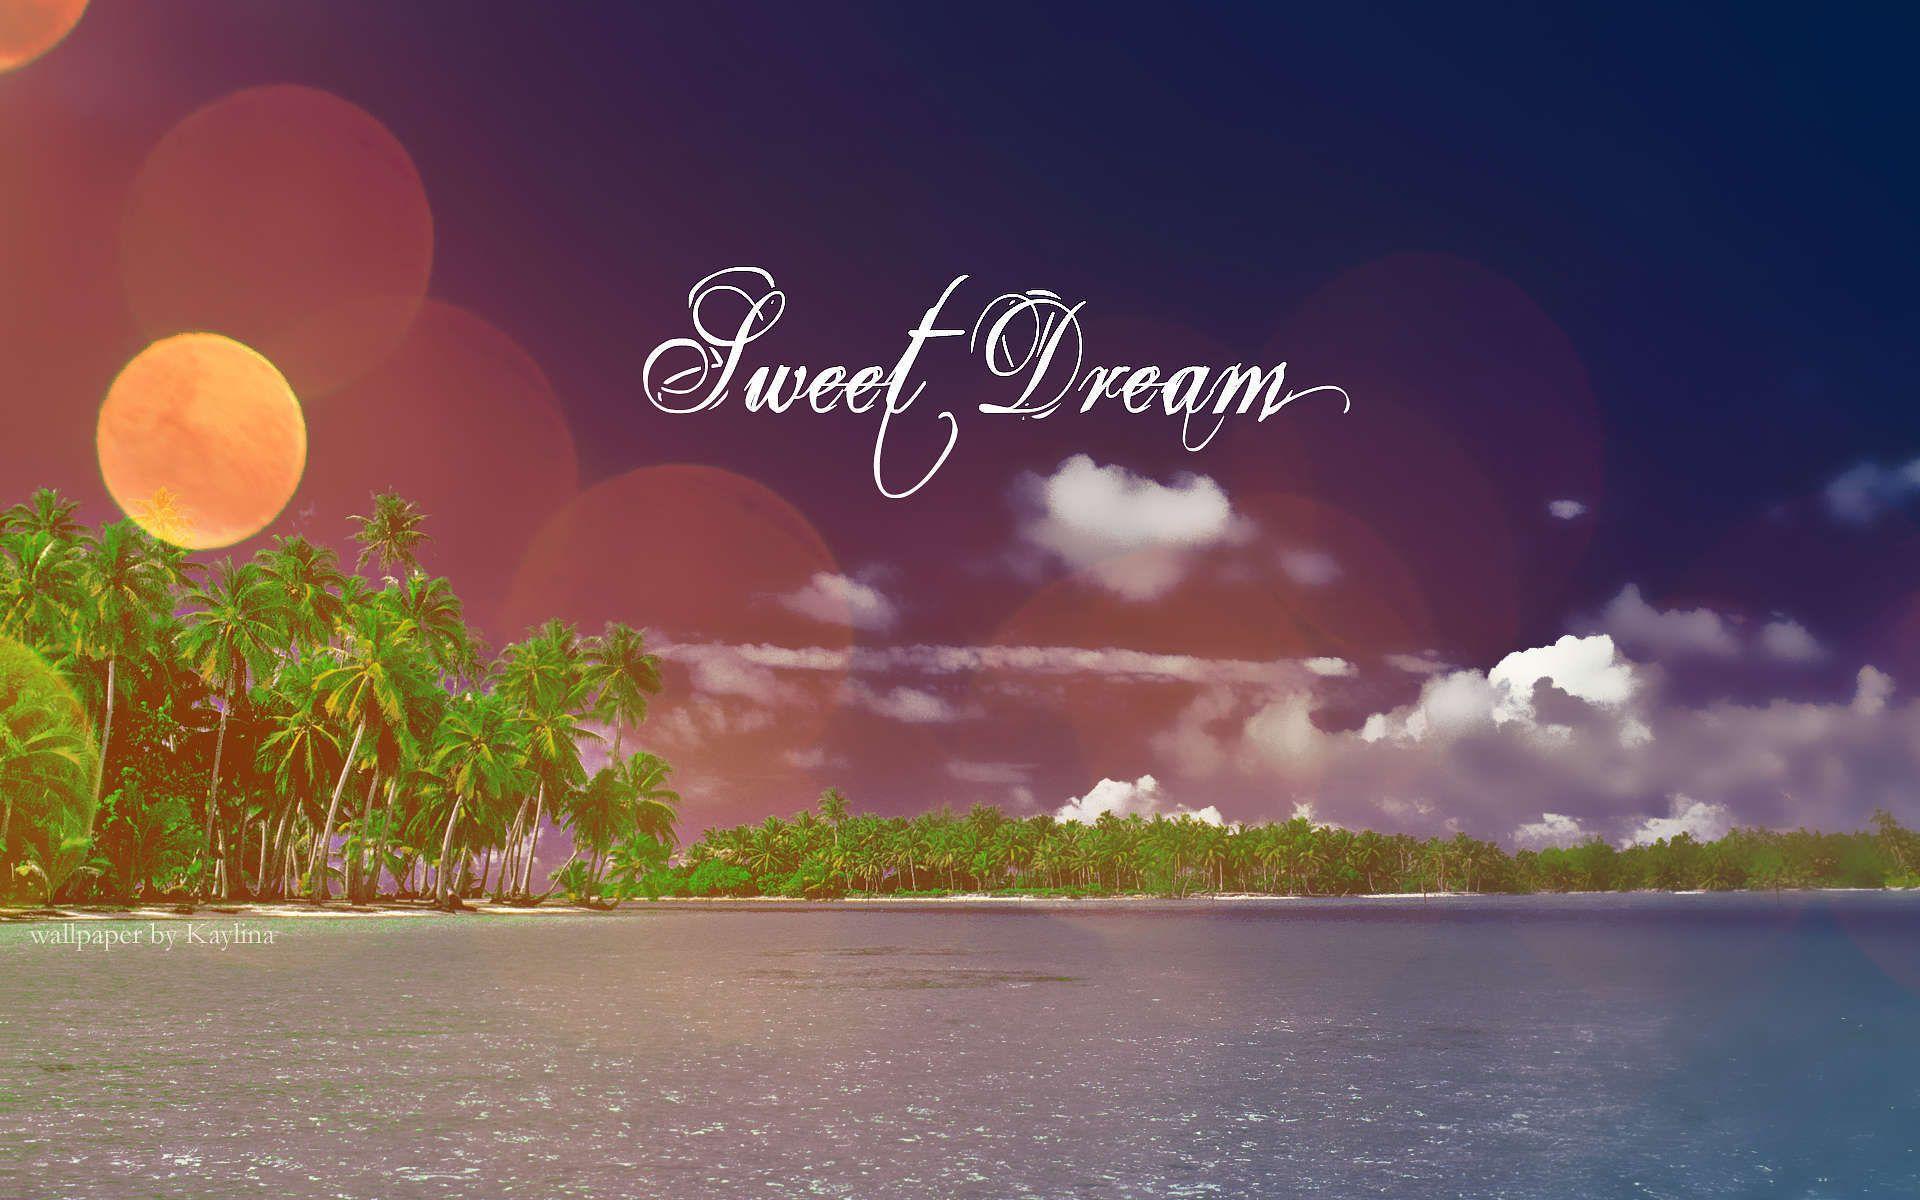 Most Inspiring Wallpaper Mobile Sweet - 44994e90c278a8d6faa958e3e8ada9c9  Perfect Image Reference_457874.jpg